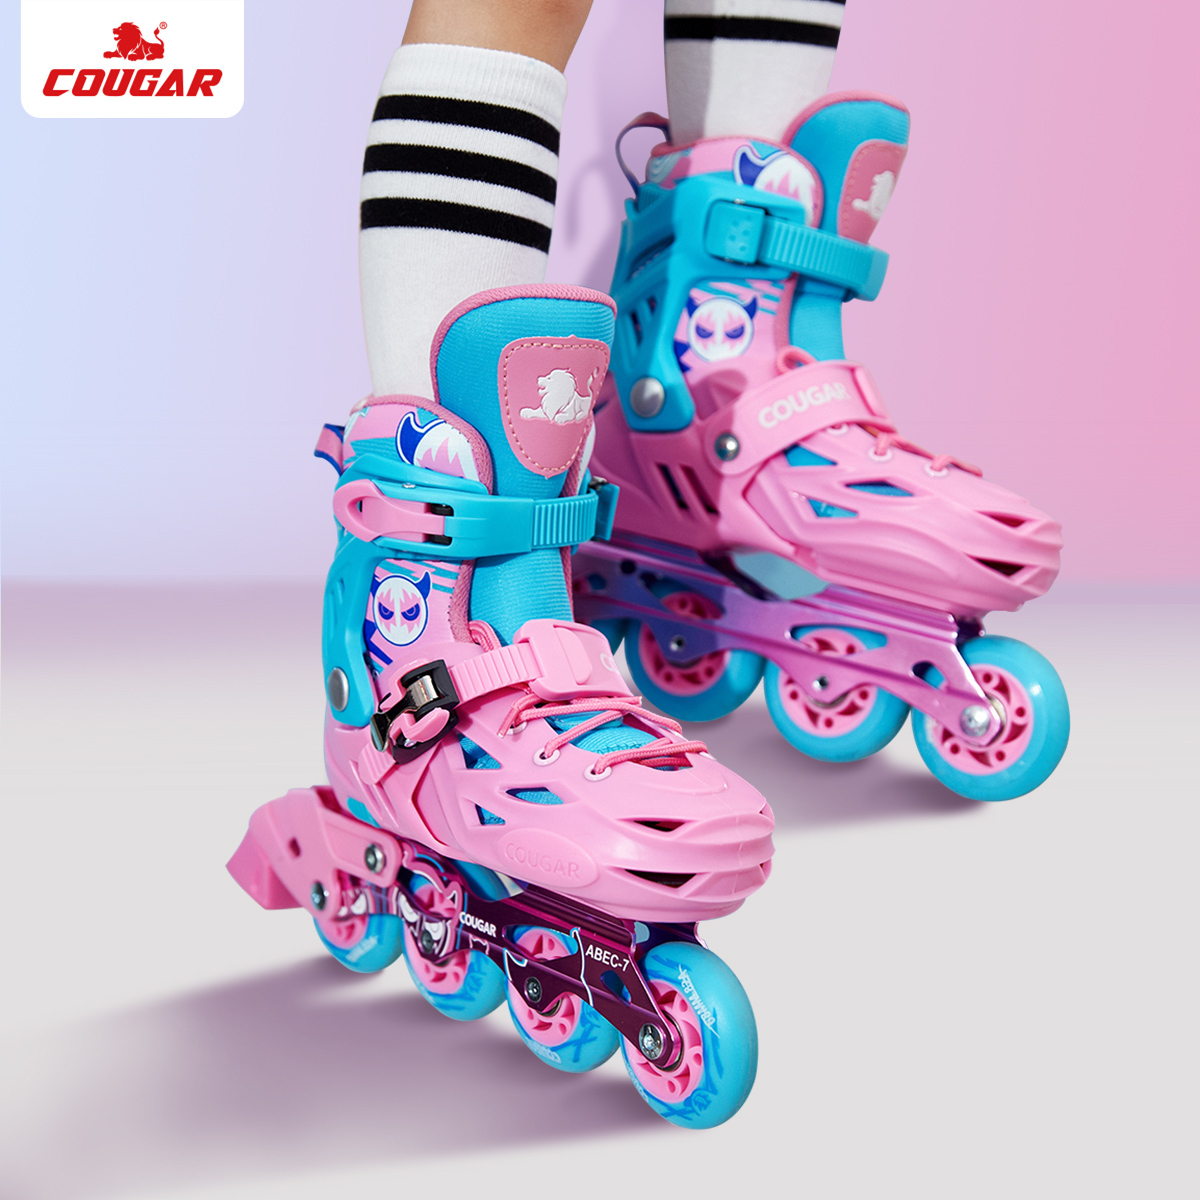 MZS303 儿童轮滑鞋套装